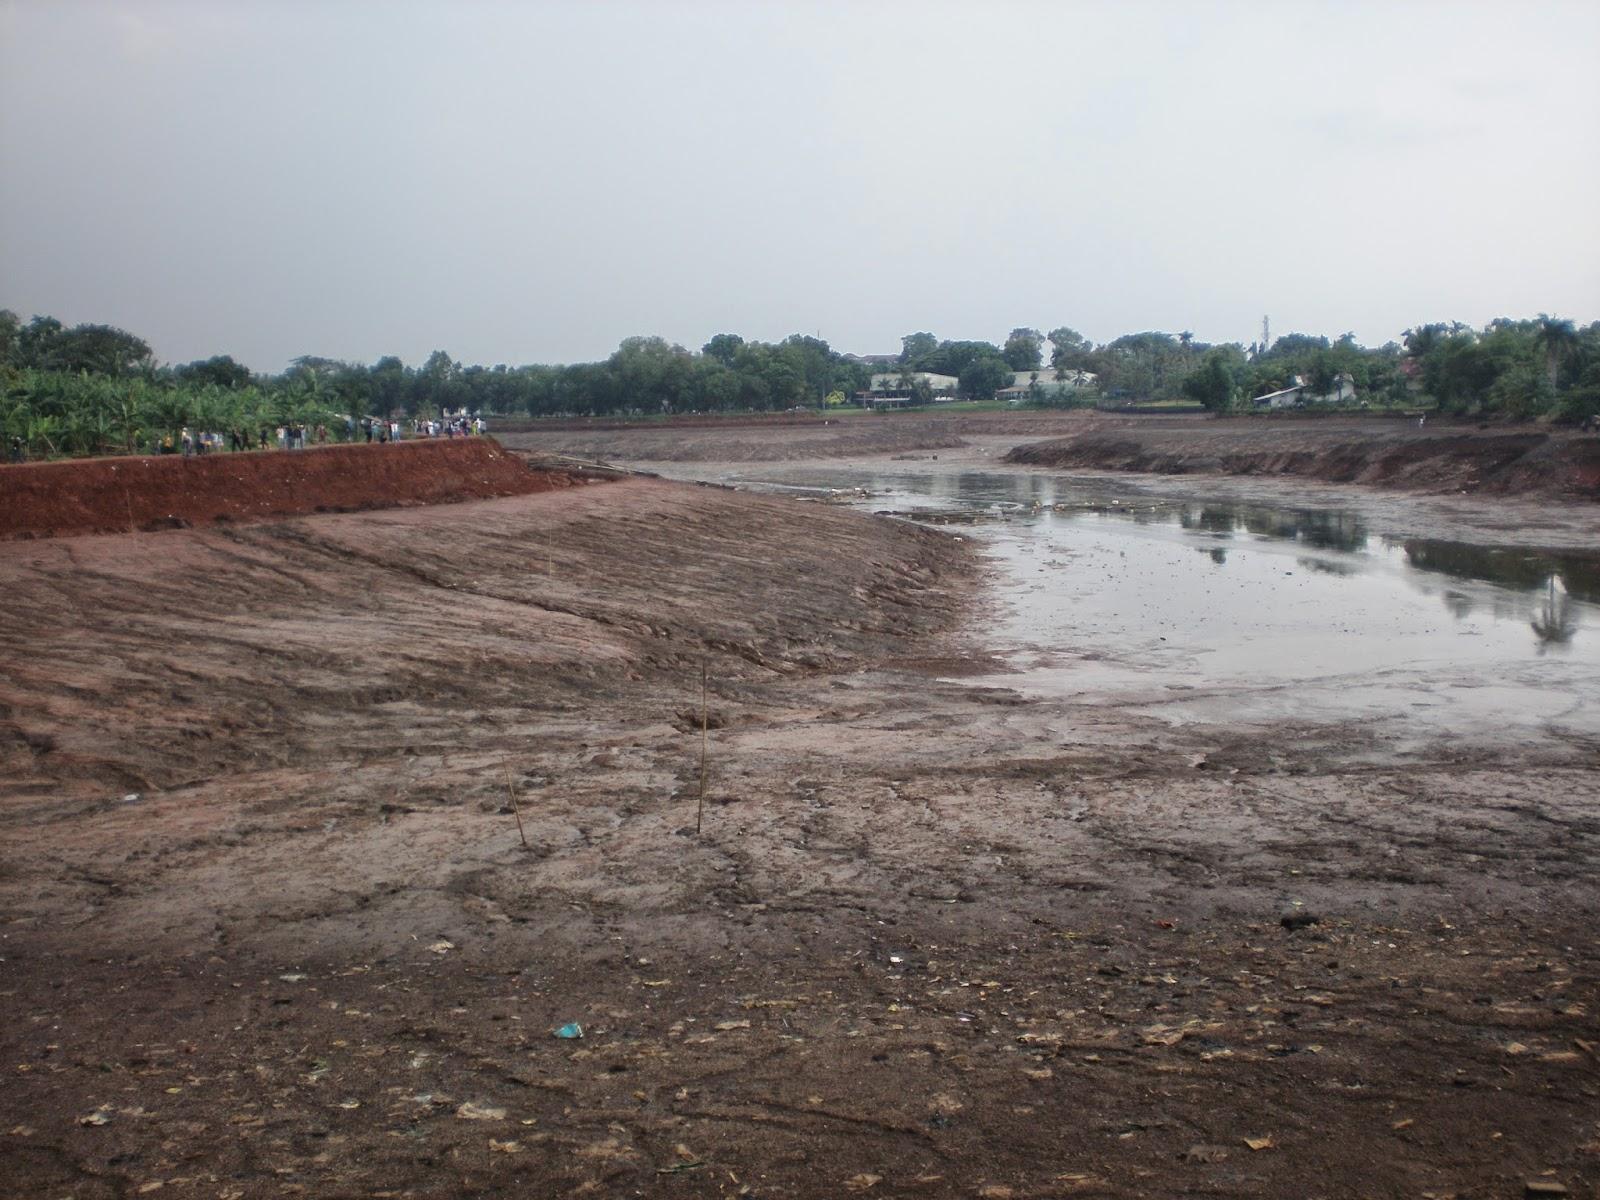 http://hendrasuhendra176.blogspot.com/2014/05/mengenang-tragedi-situ-gintung.html